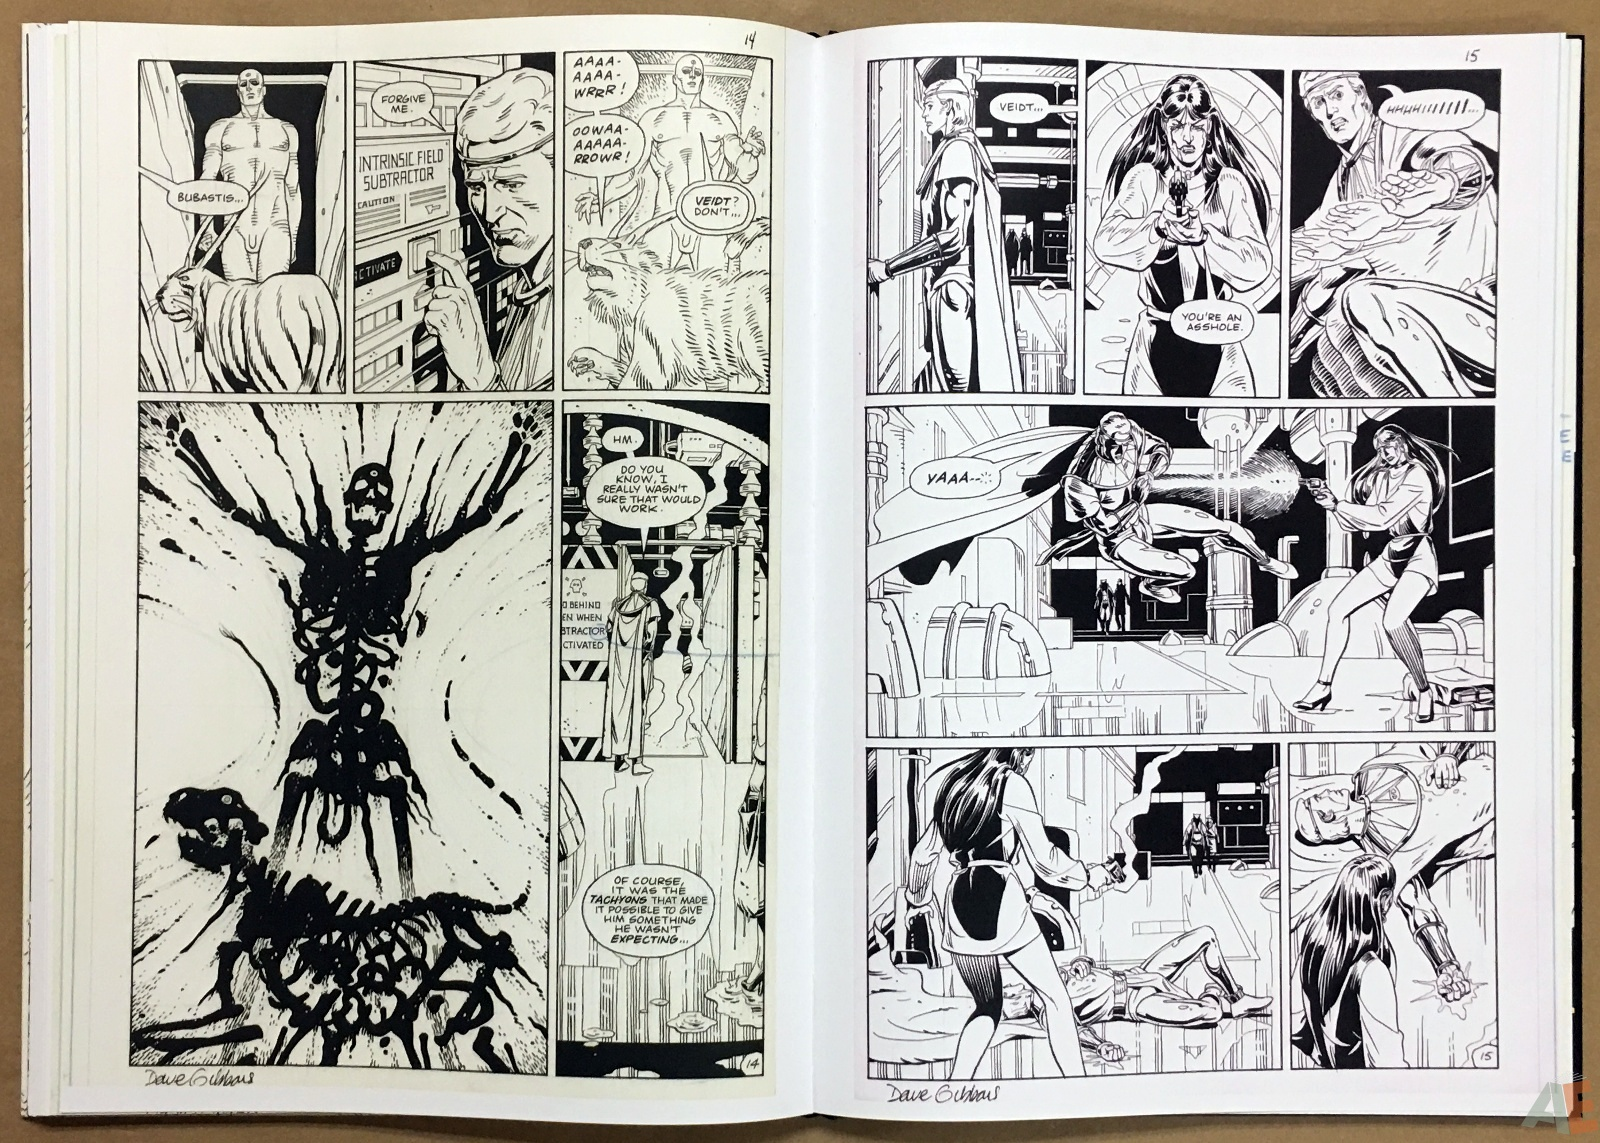 Dave Gibbons Watchmen Artifact Edition 30